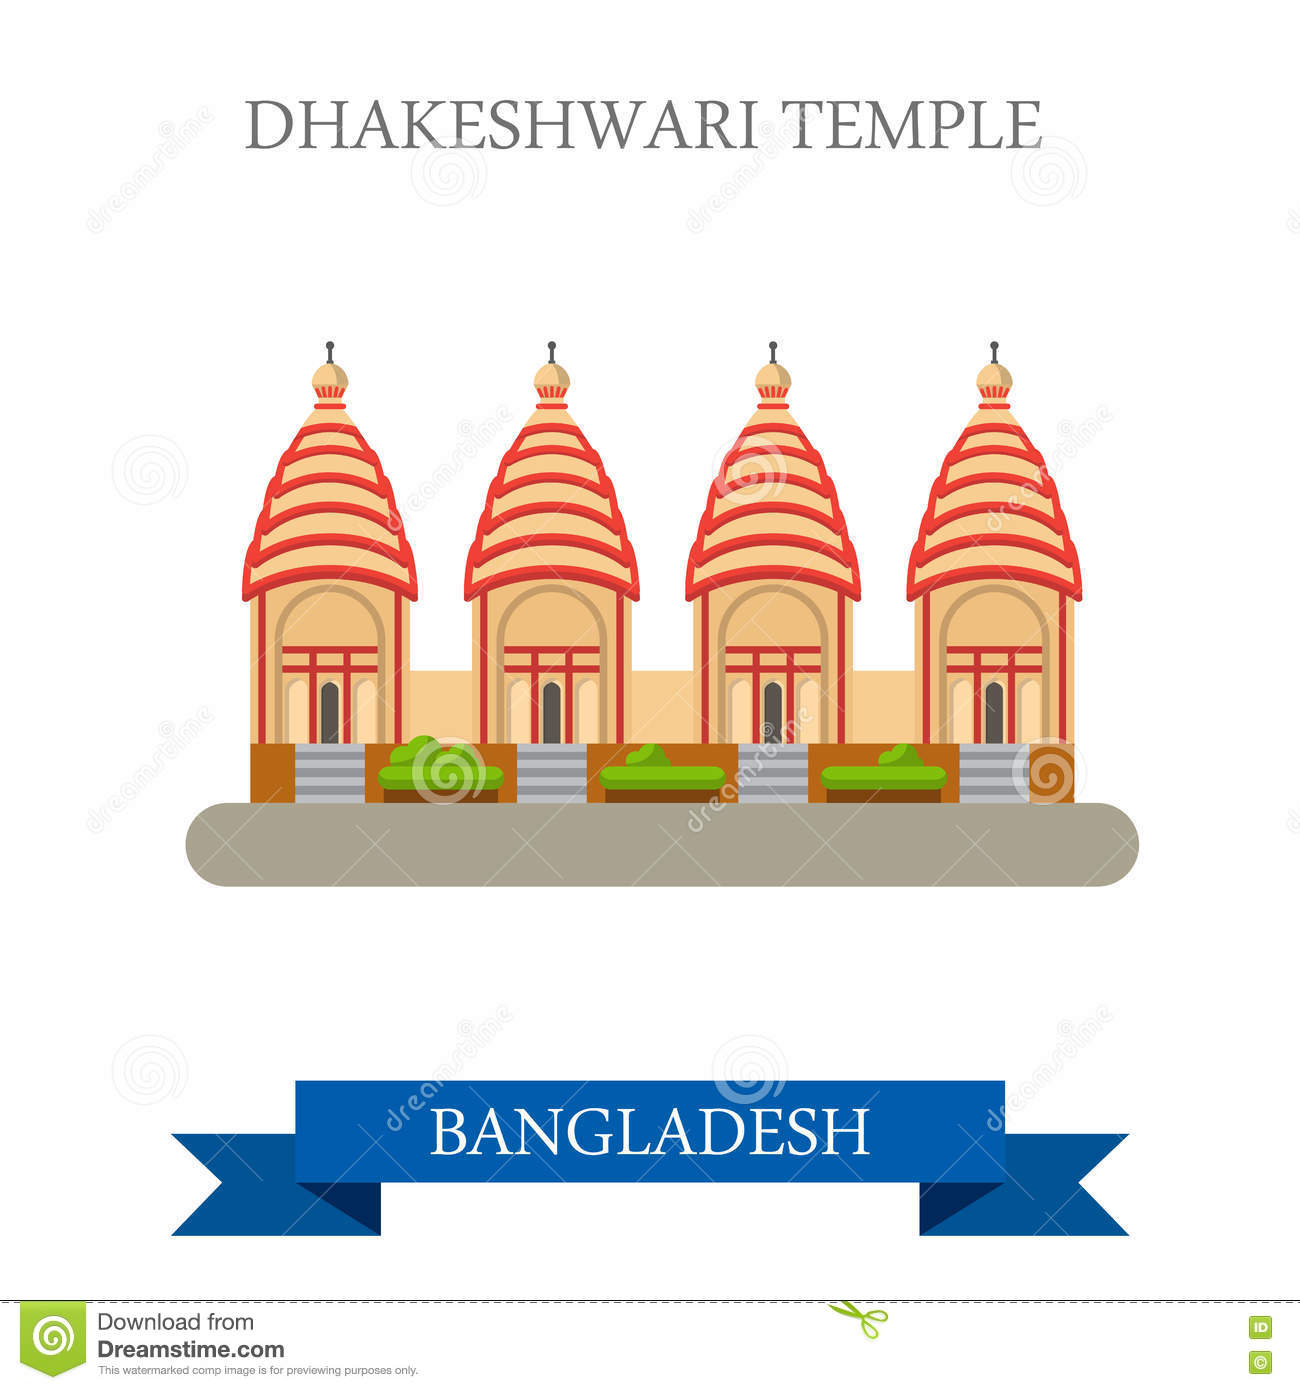 Dhakeshwari Temple Bangladesh Landmarks Vector Flat Attraction.